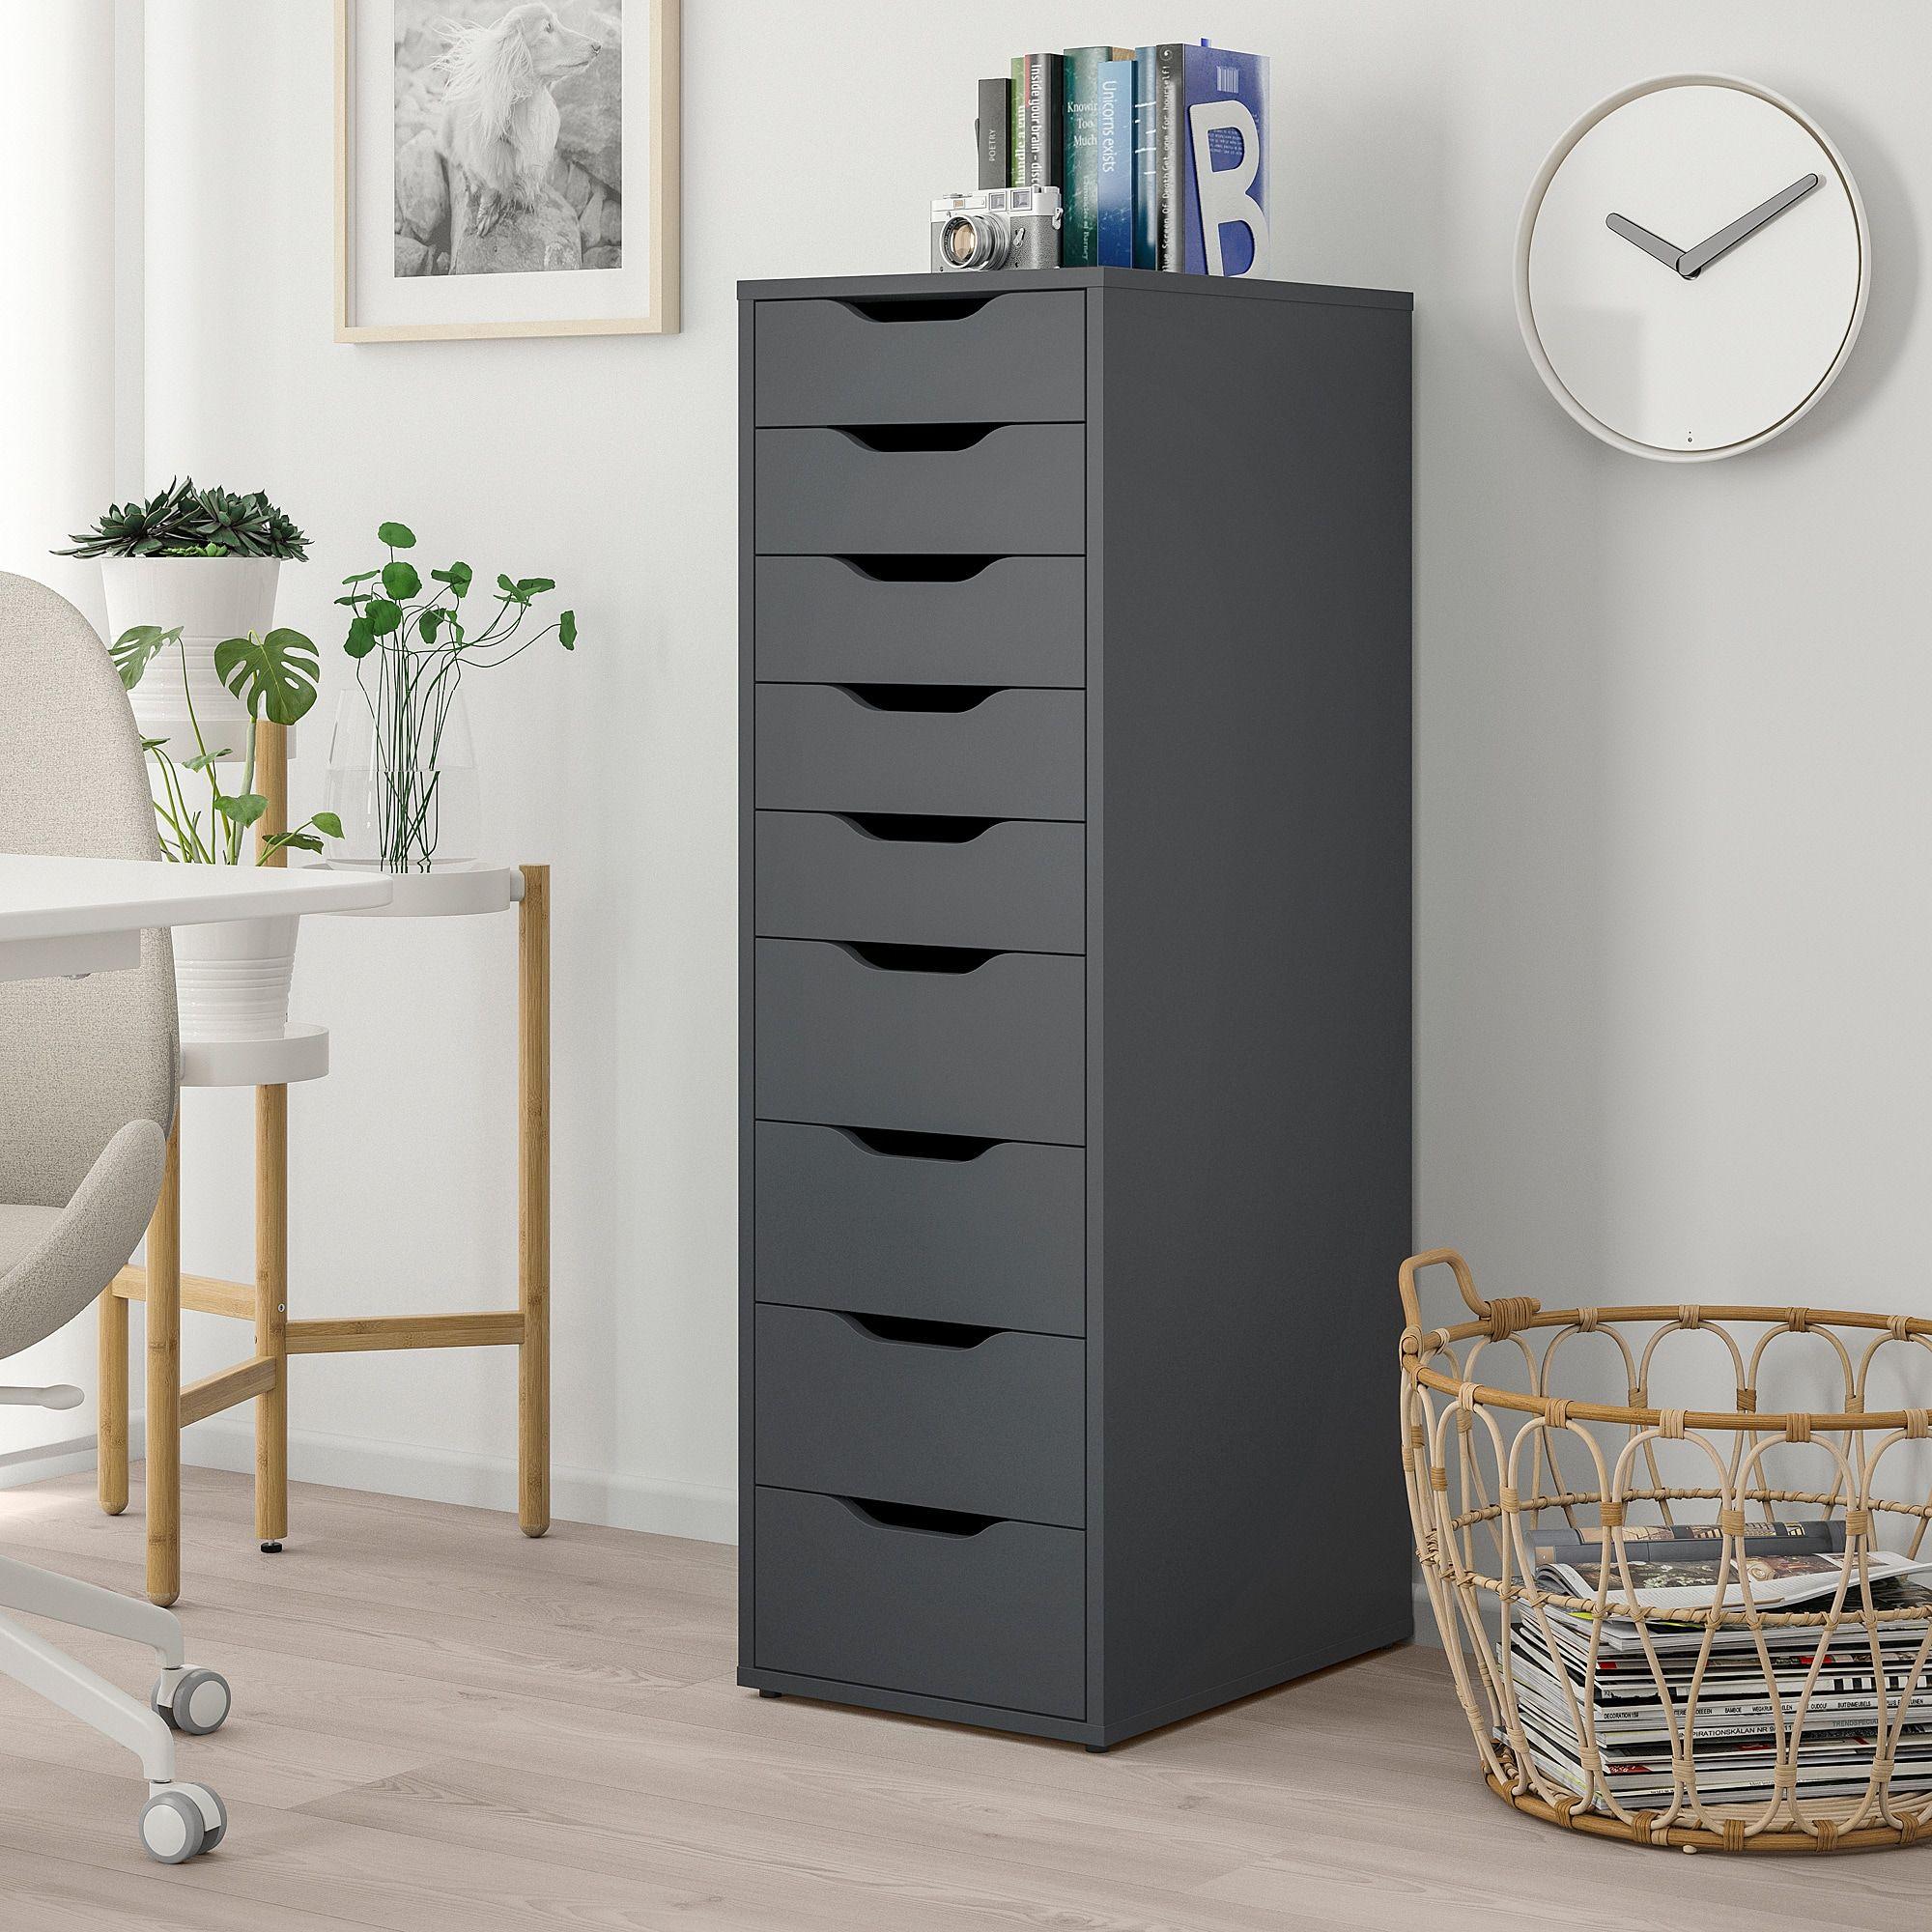 IKEA ALEX chest of drawers • Grey • 5